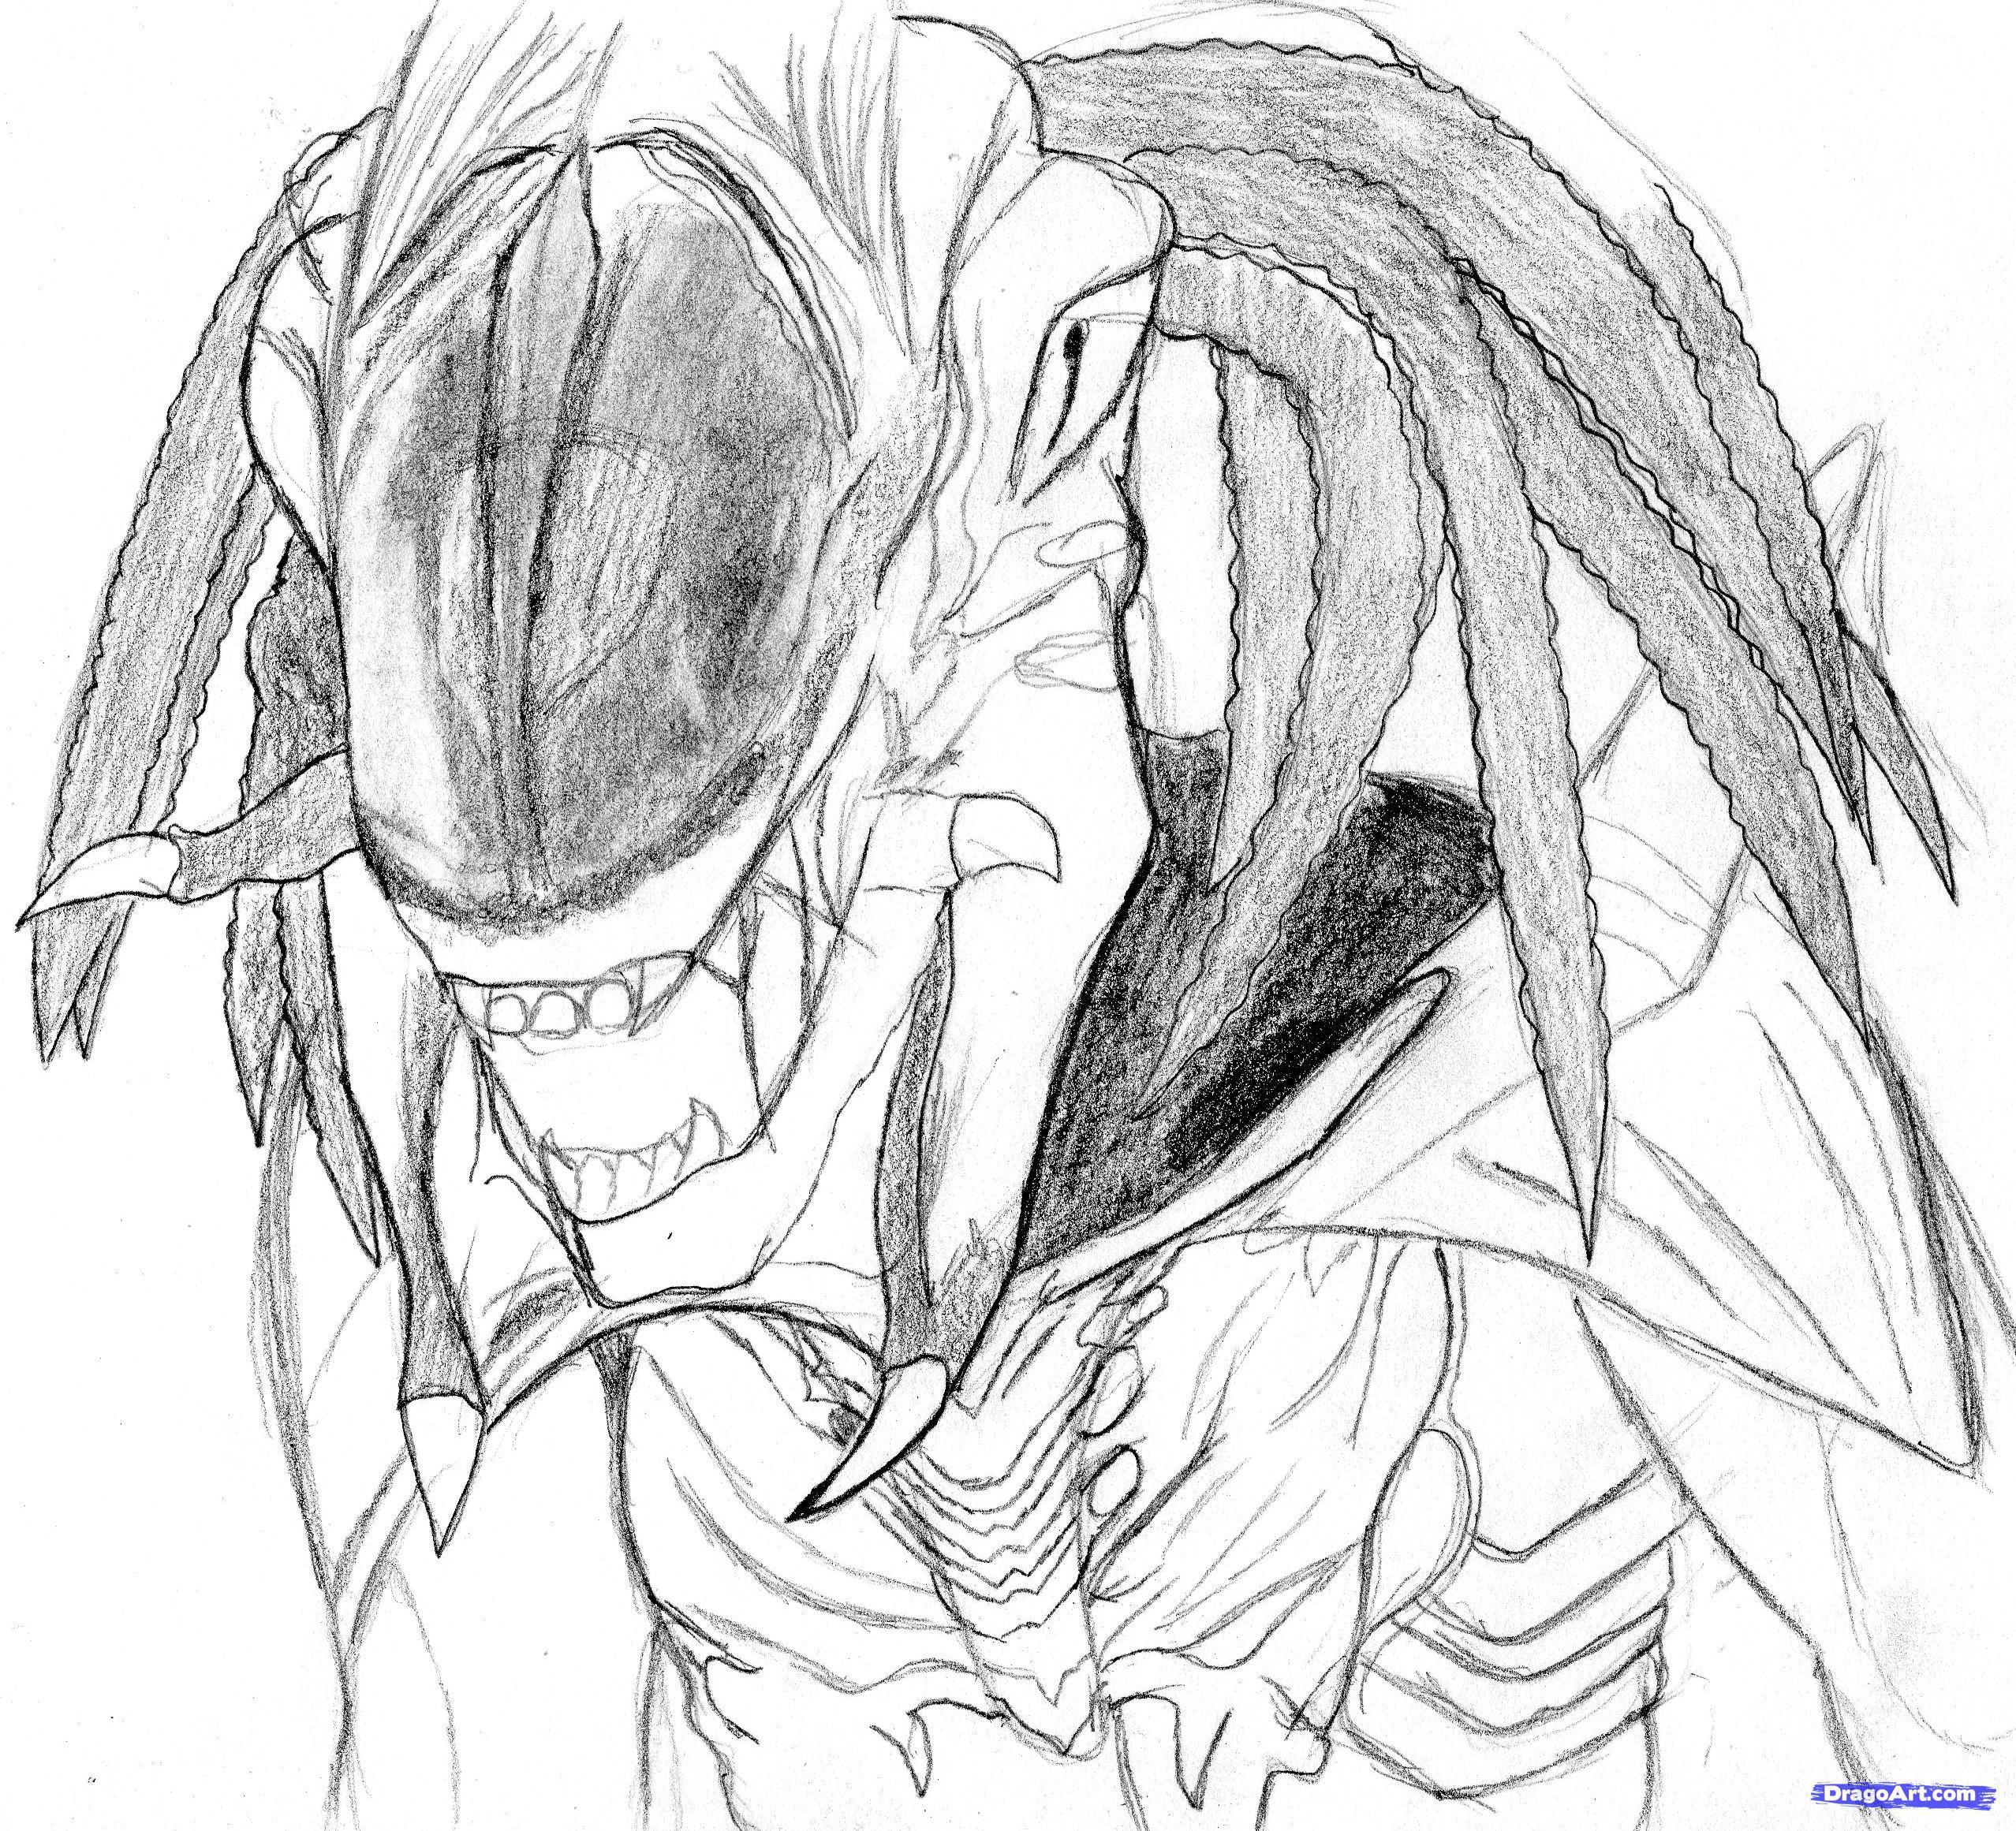 Drawn predator alien vs predator To fi to draw FREE